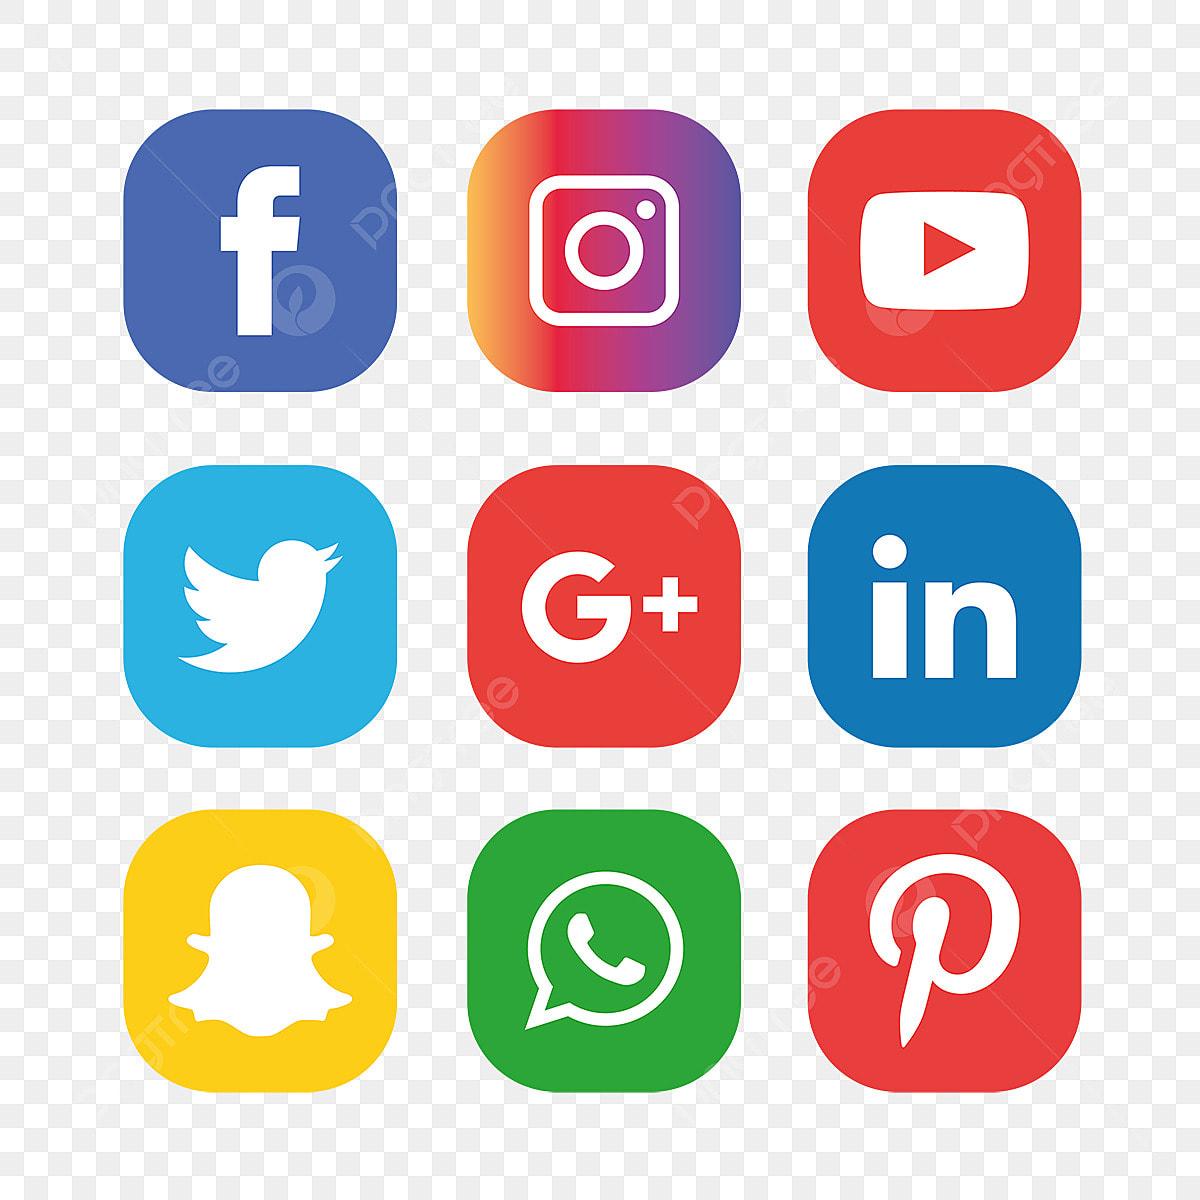 les m u00e9dias sociaux d ic u00f4nesfacebook instagram whatsapp